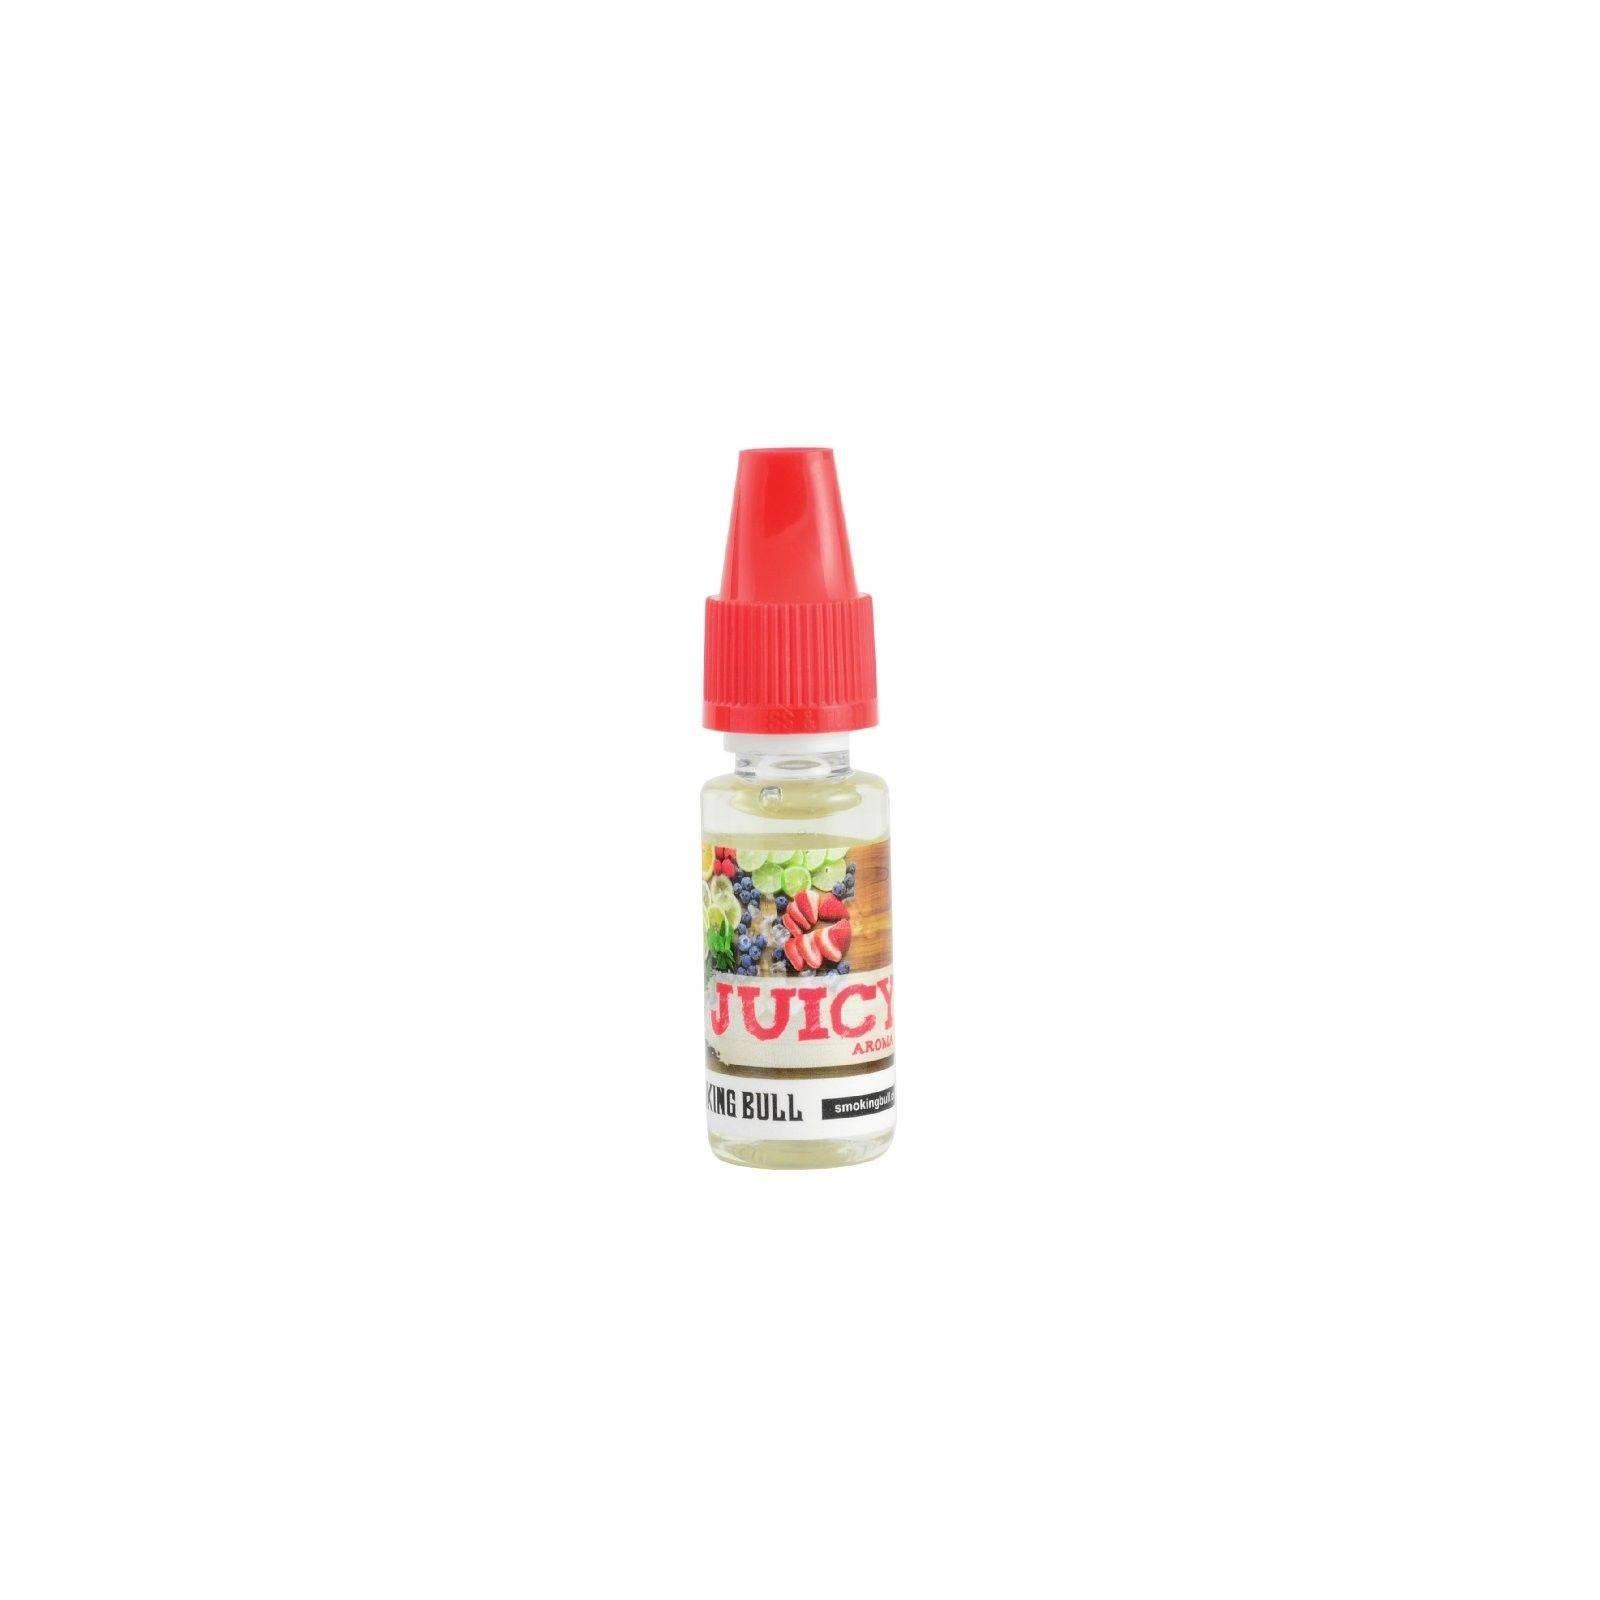 Concentré Juicy - Smoking Bull